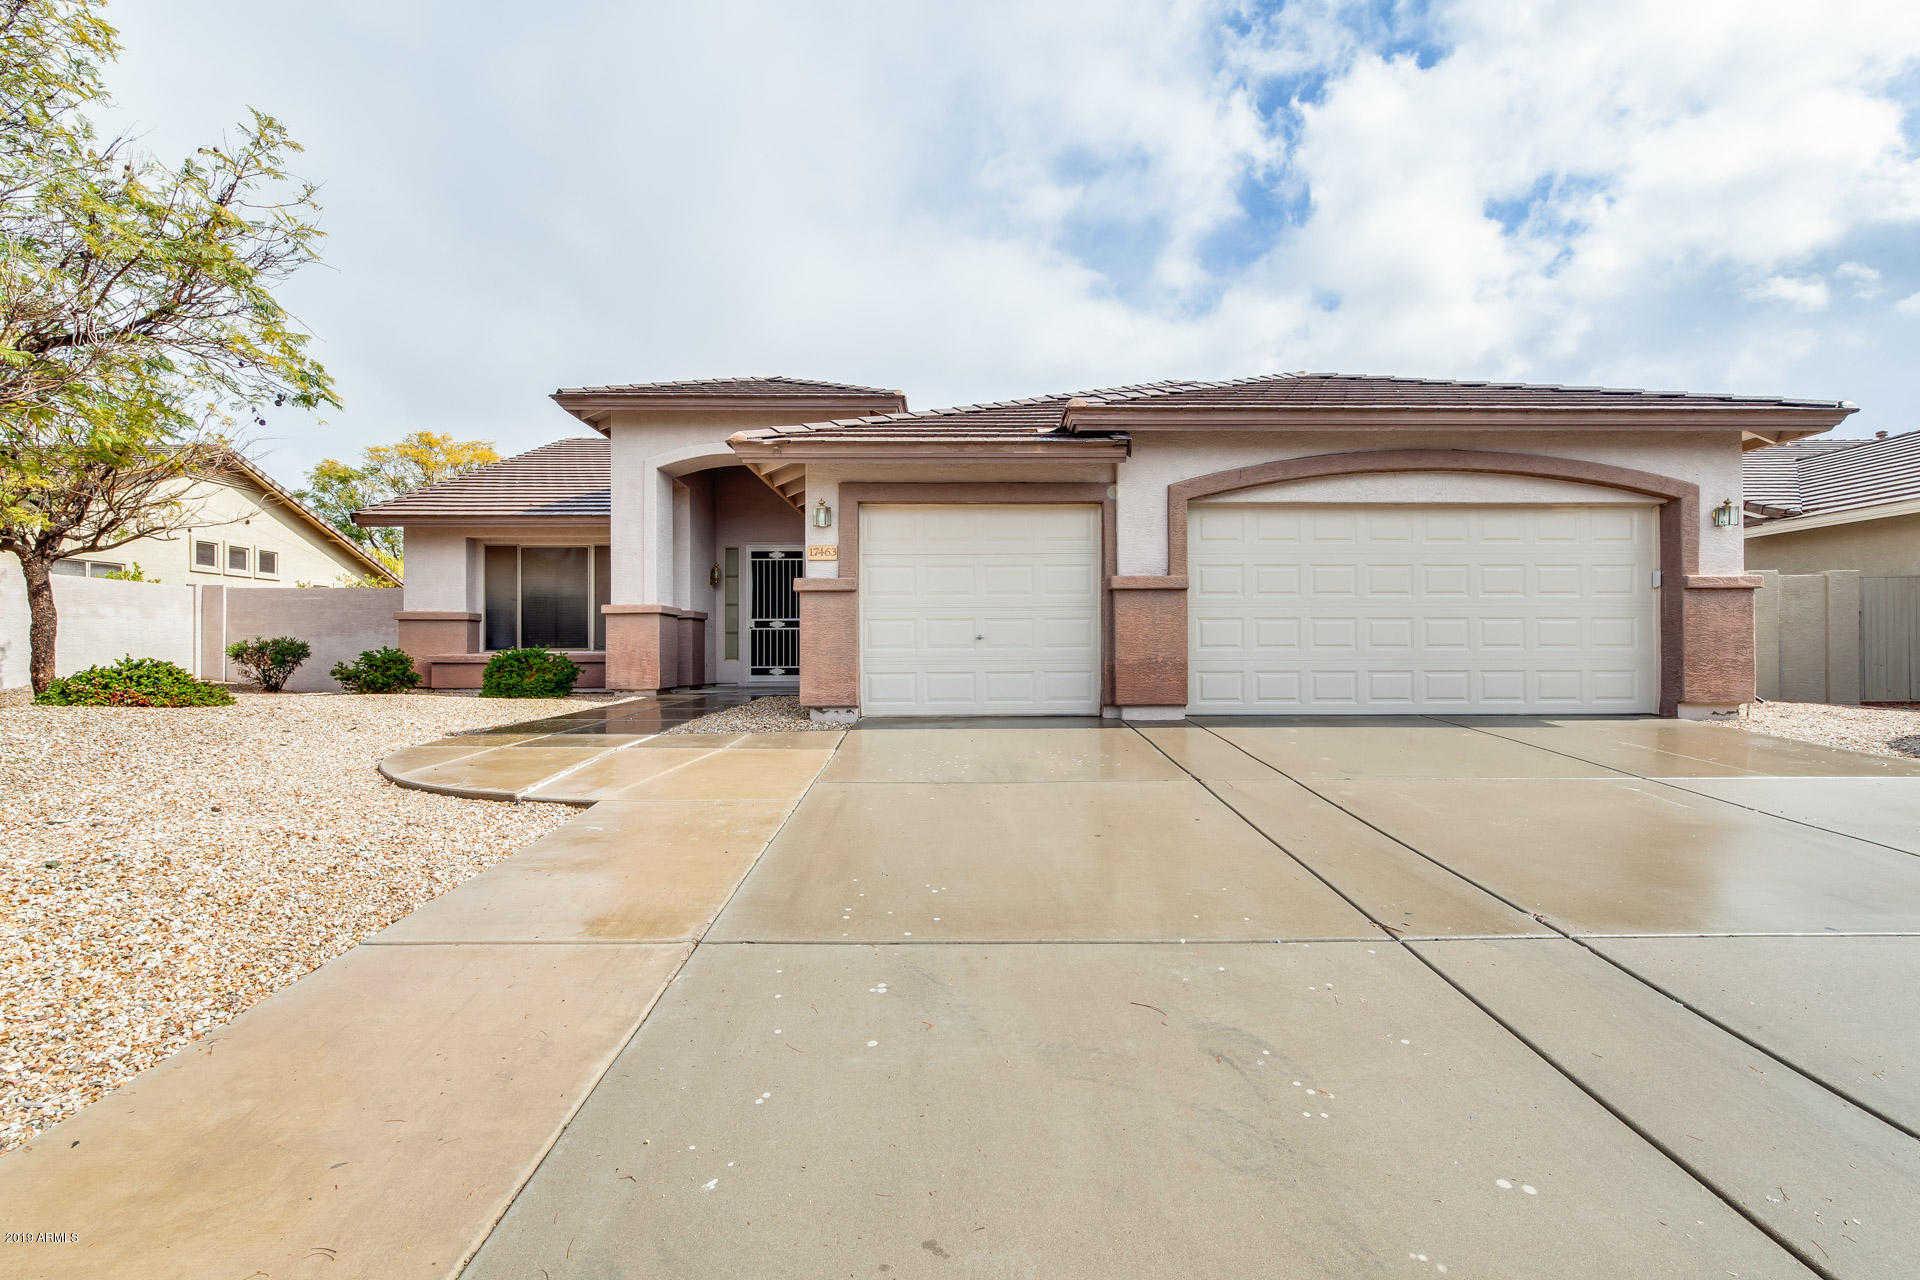 $399,000 - 3Br/2Ba - Home for Sale in Coventry Estates, Glendale